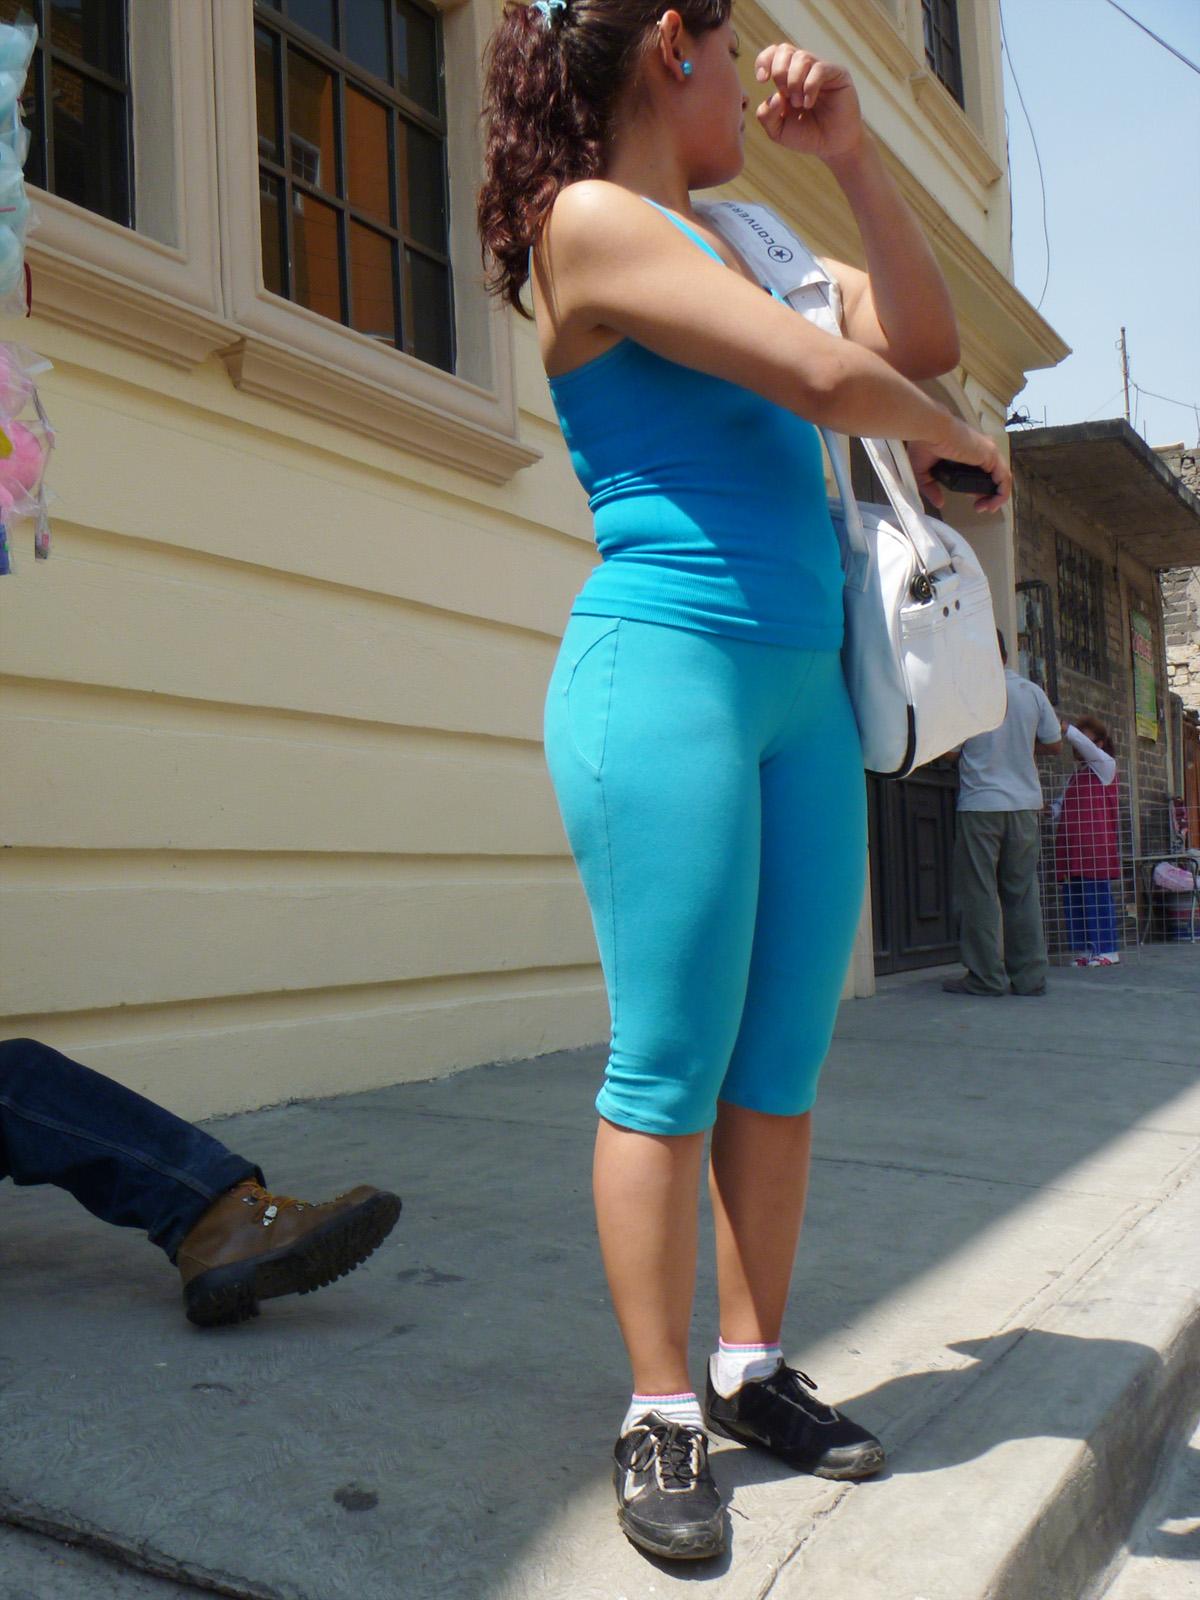 prostitutas de la calle xxx porno con prostitutas casero